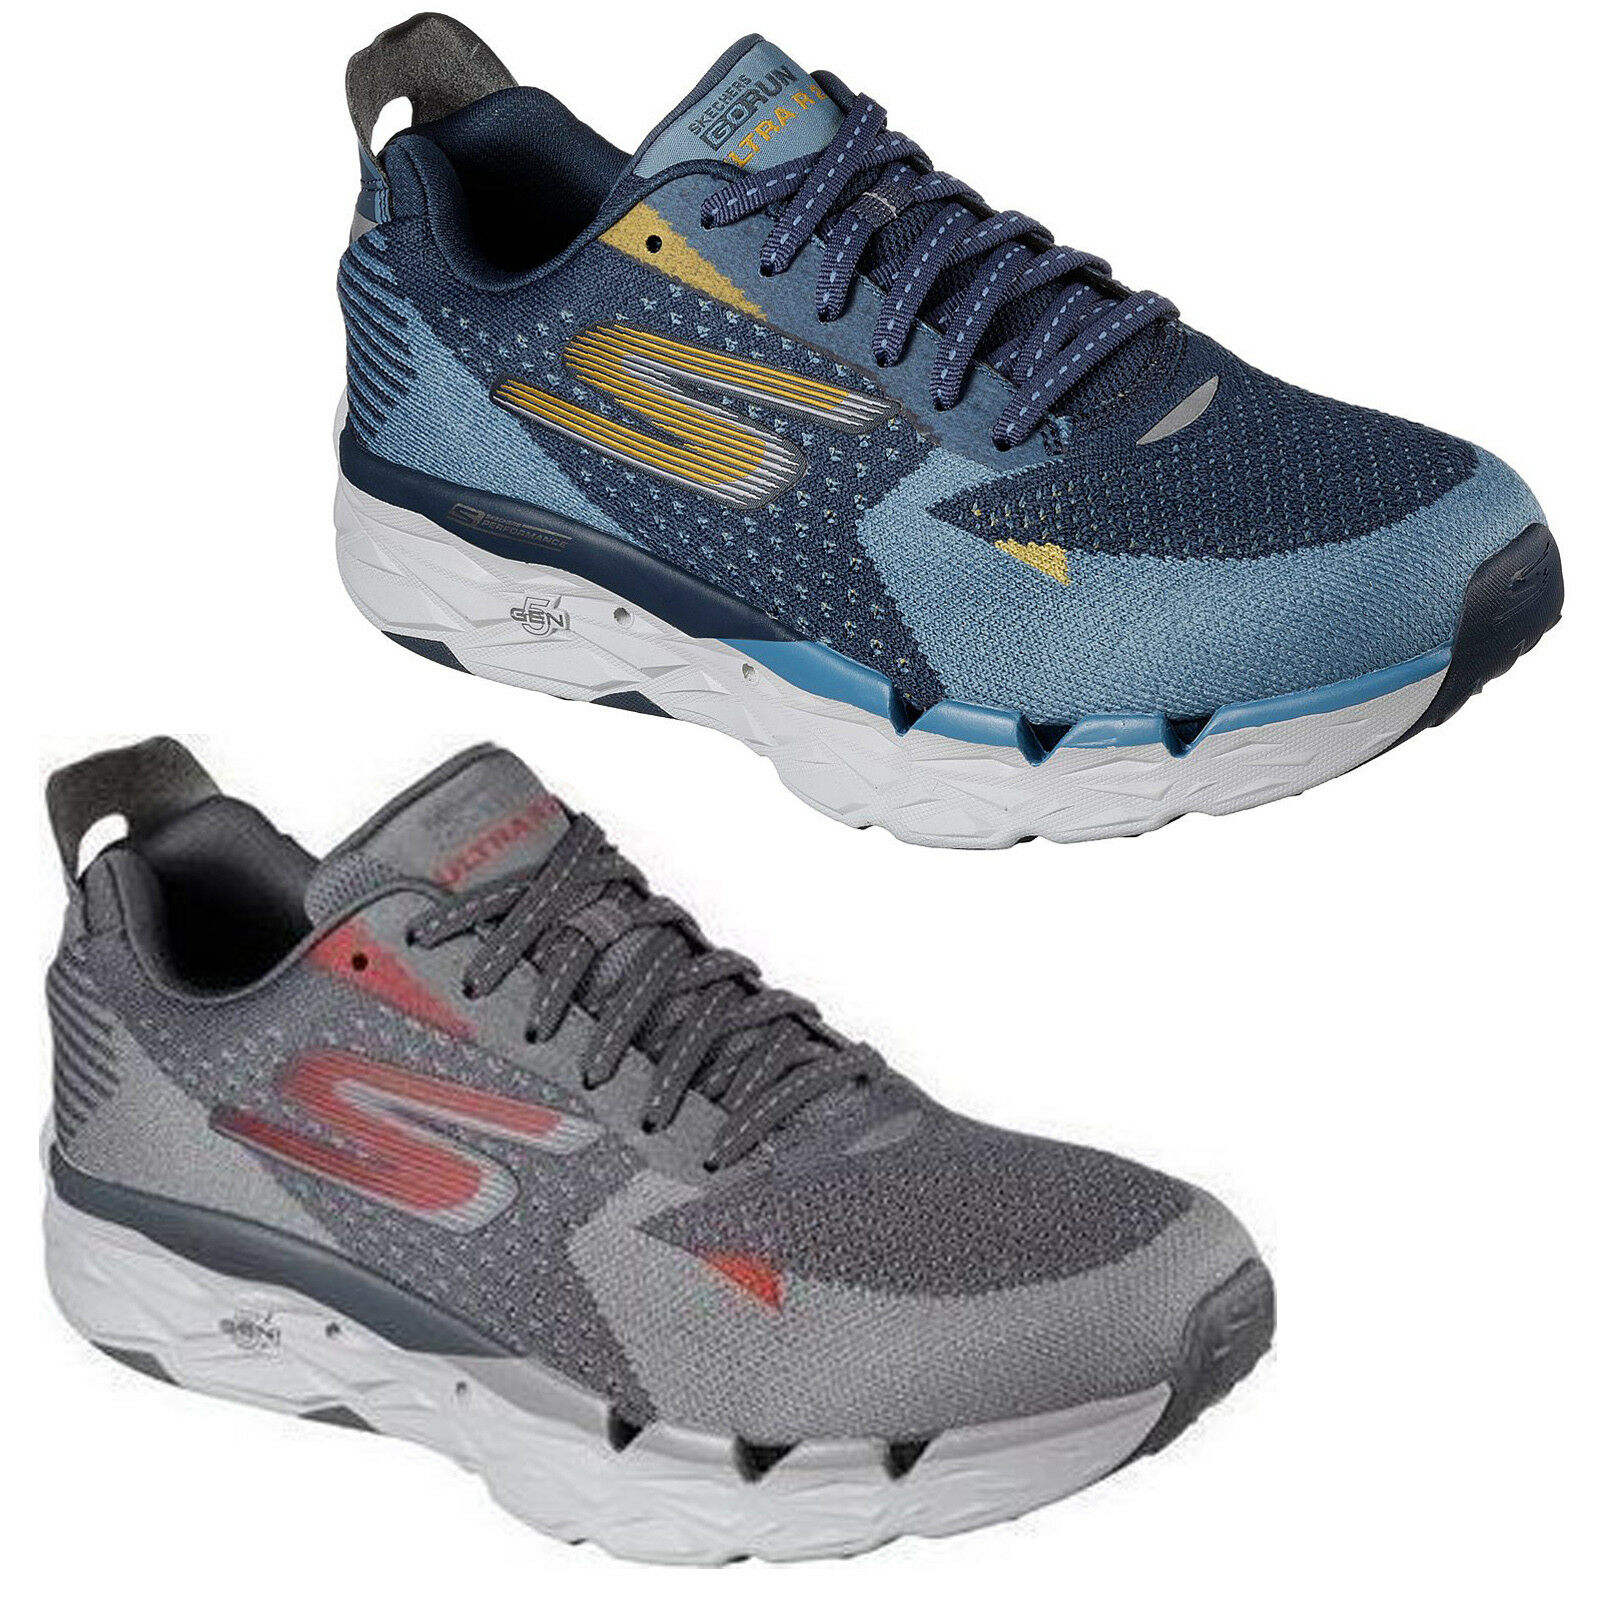 32a48cd2d9439 Skechers GoRun Ultra Road 2 Trainers Mens Memory Foam Light Sports Shoes  55050